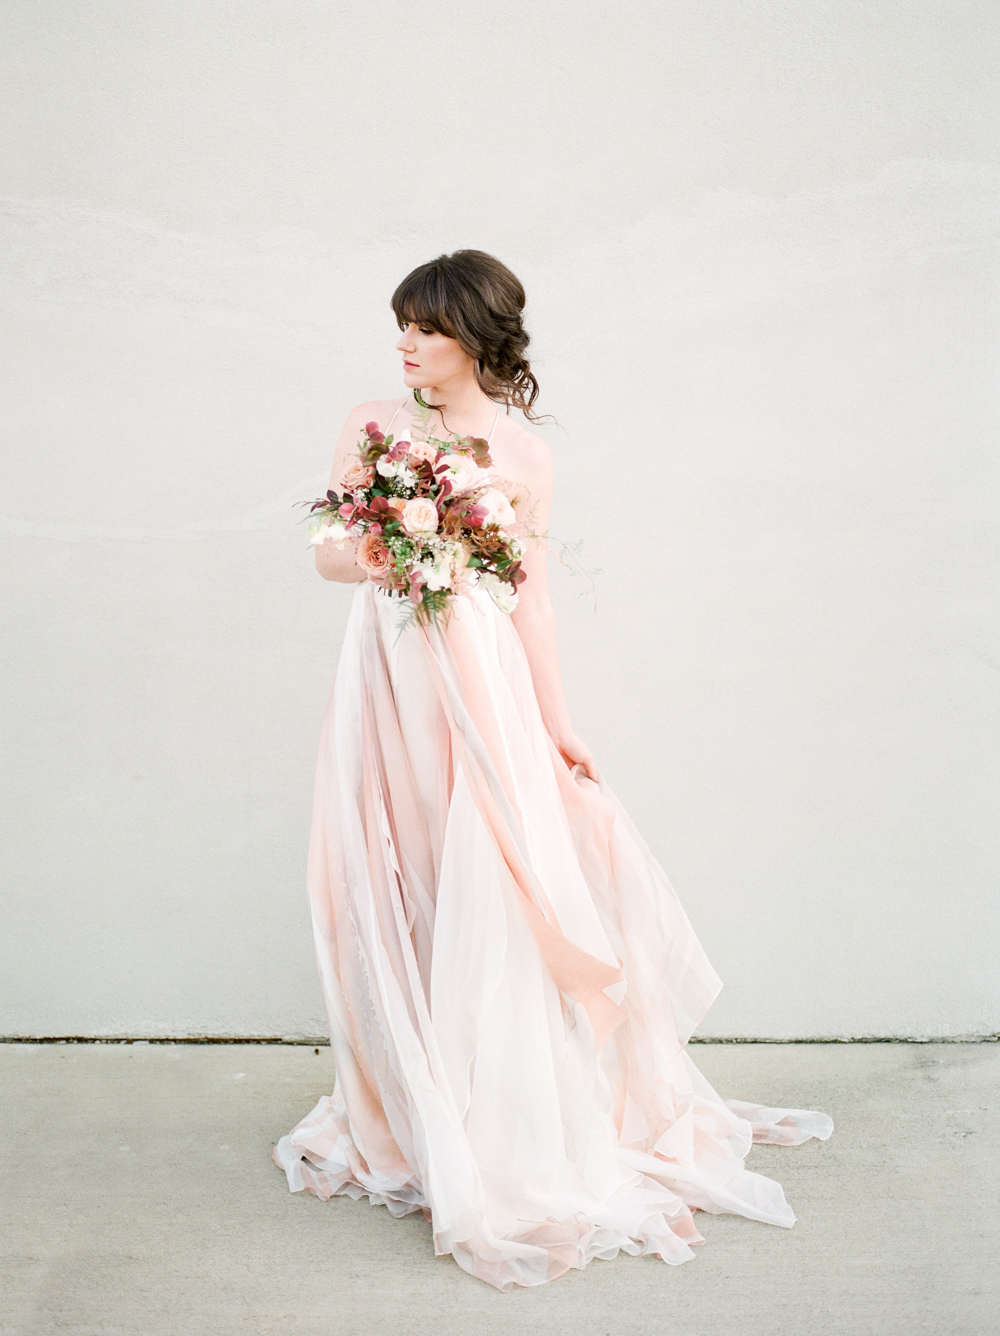 A lovely houston bride_wedding_Christine Gosch_www.christinegosch.com_Houston, TX-14.jpg